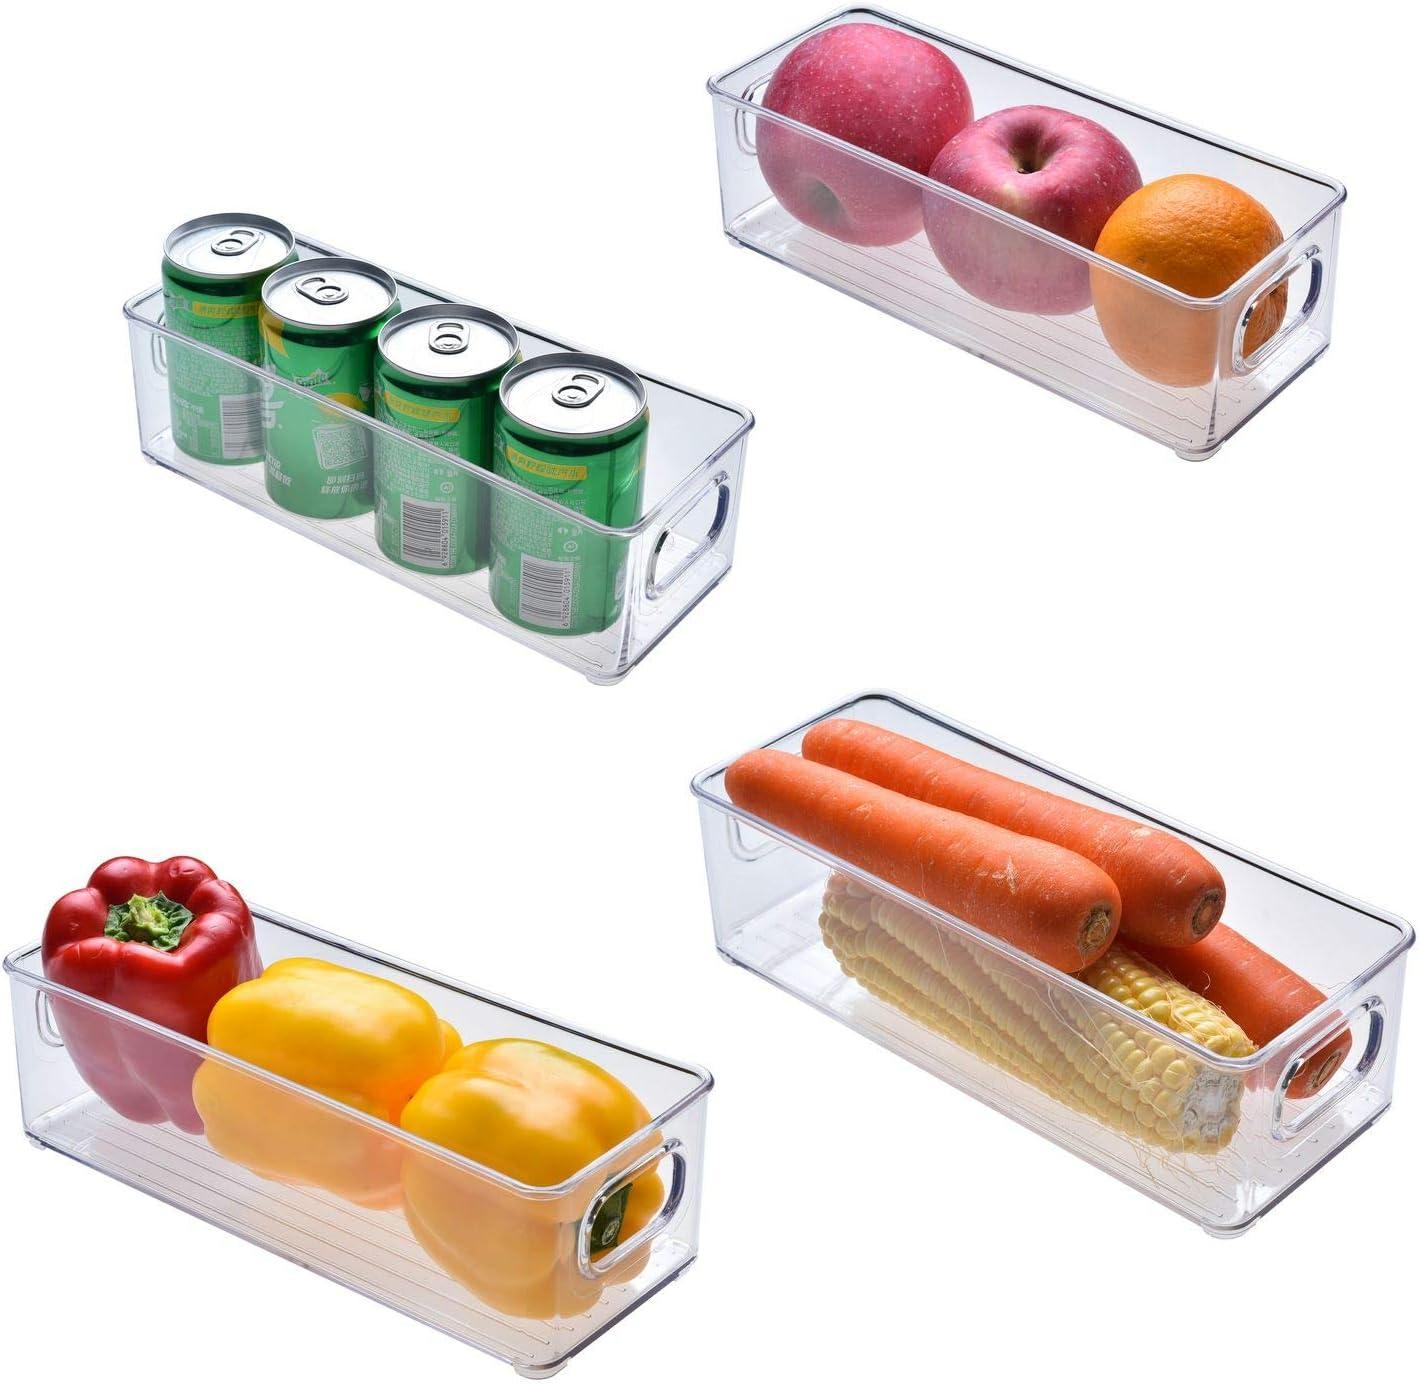 TNQQMie Refrigerator Organizer Bins - 4pcs,for Fridge, Freezer, Kitchen Cabinet, Pantry Organization,Stackable Plastic Food Storage Bin with Handles,BPA Free, 10